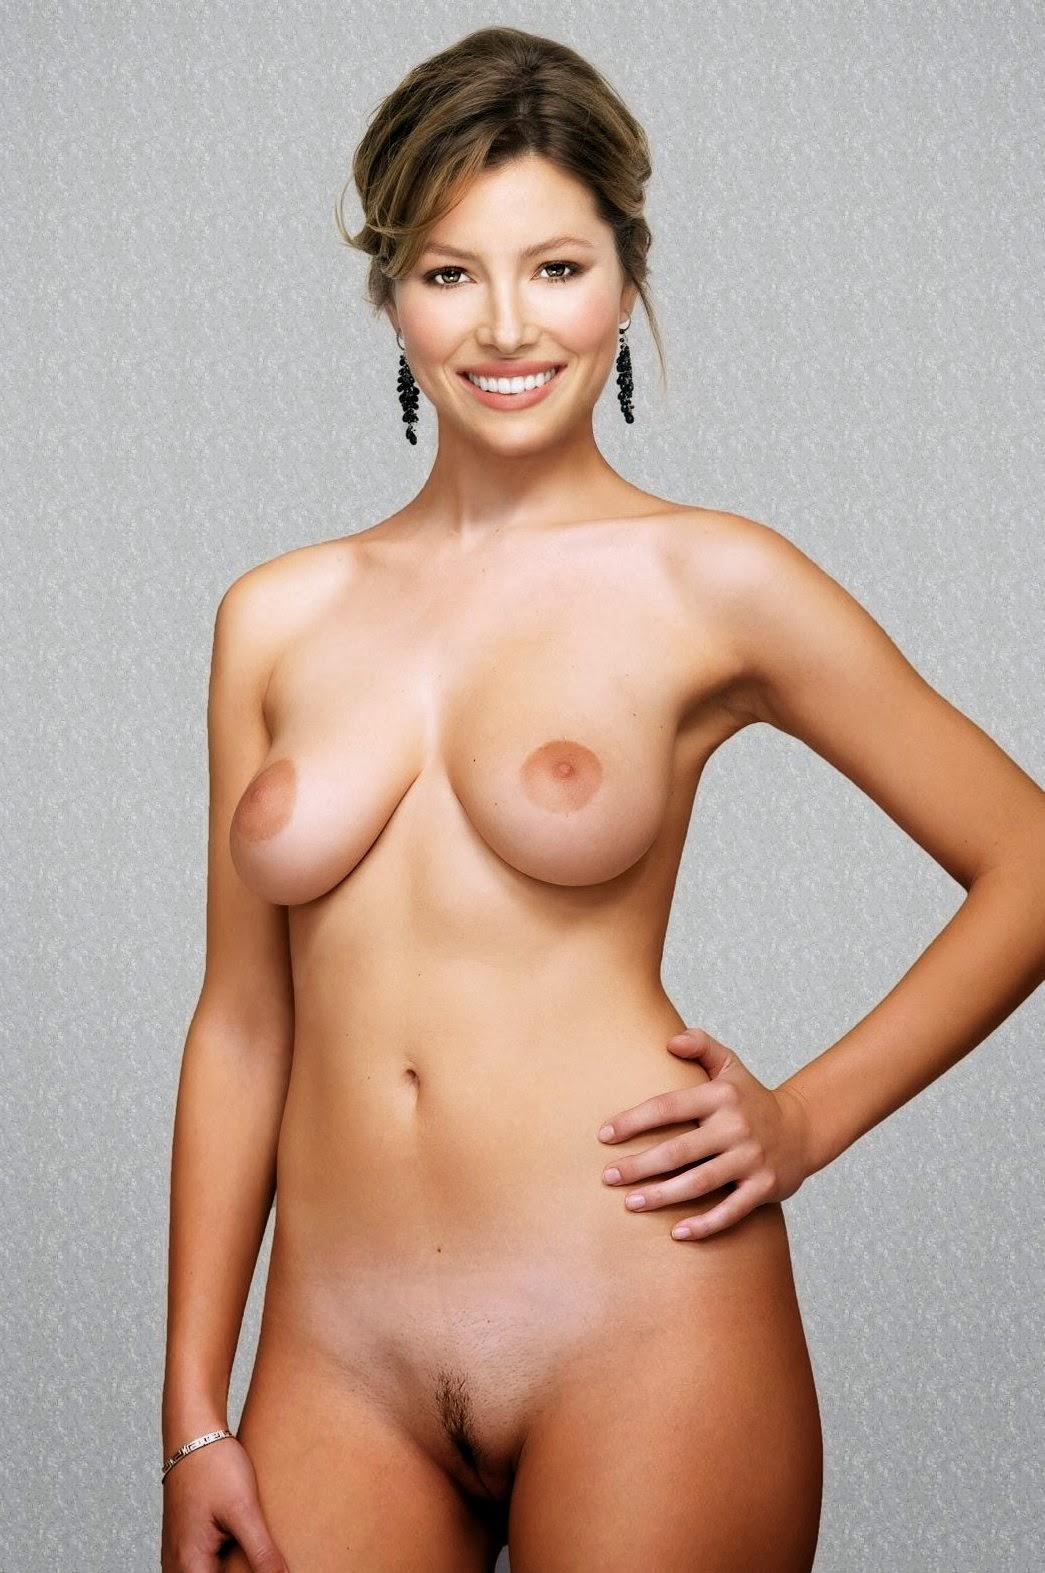 Celeb fake nude